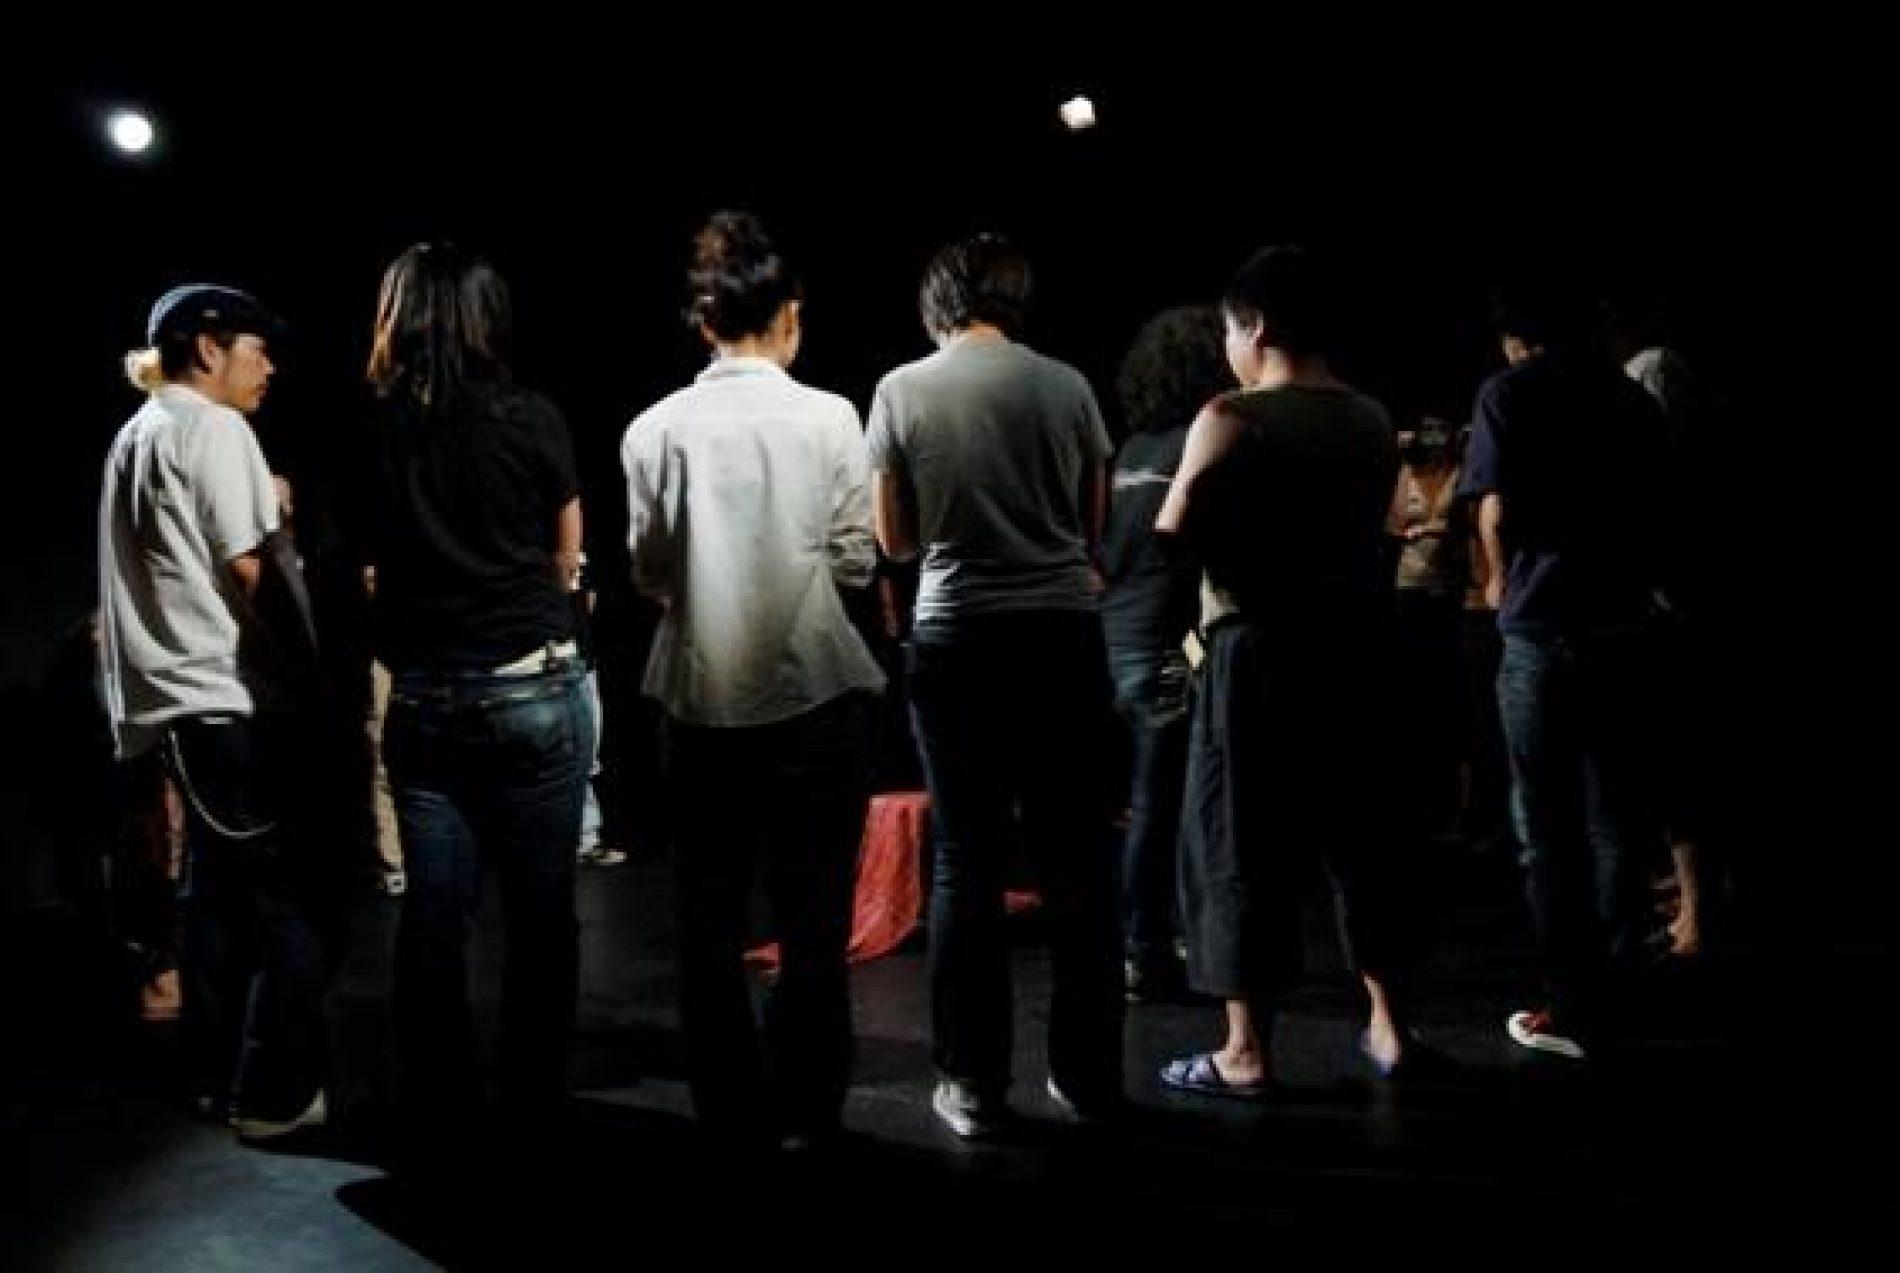 2007 .kör. performansz – Nagoya, Oosu, Nanatsudera Kyodo Studio – The 12th NIPAF Asia Performance Art Series 07 – JP